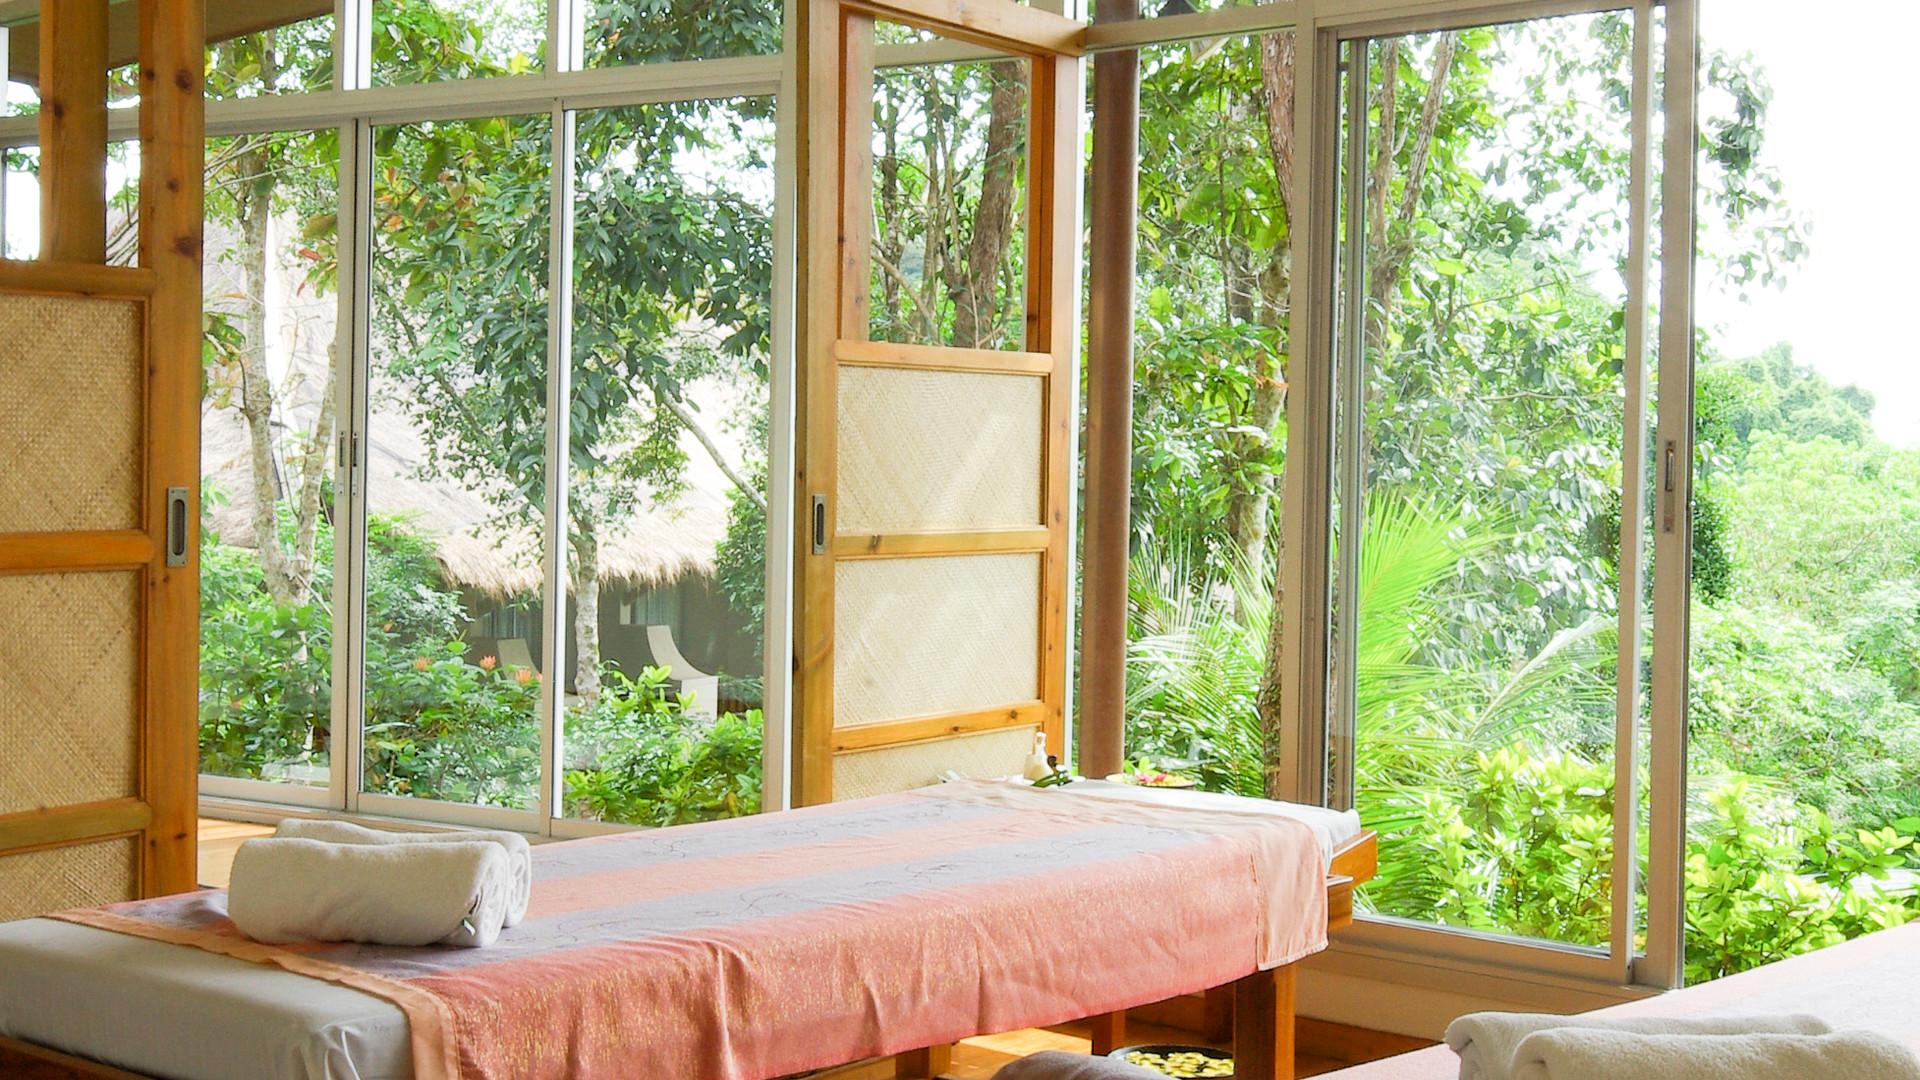 spa-open-nature-room_HDETuy_2zg.jpg